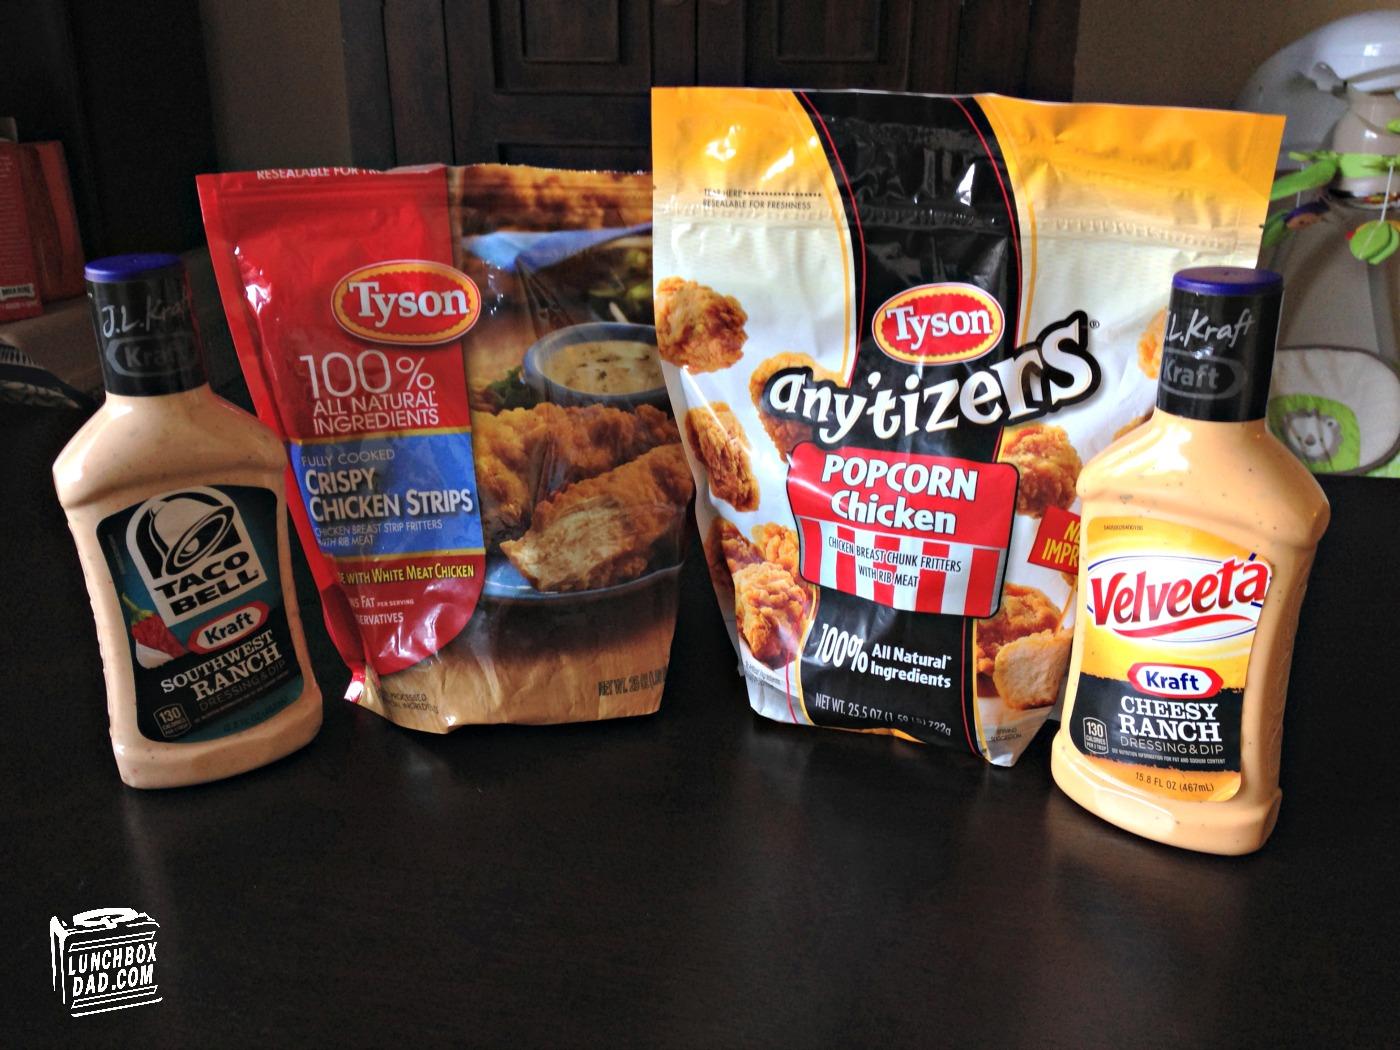 Tyson Chicken and Kraft Ranch Dip #SuperMoments #cbias #ad